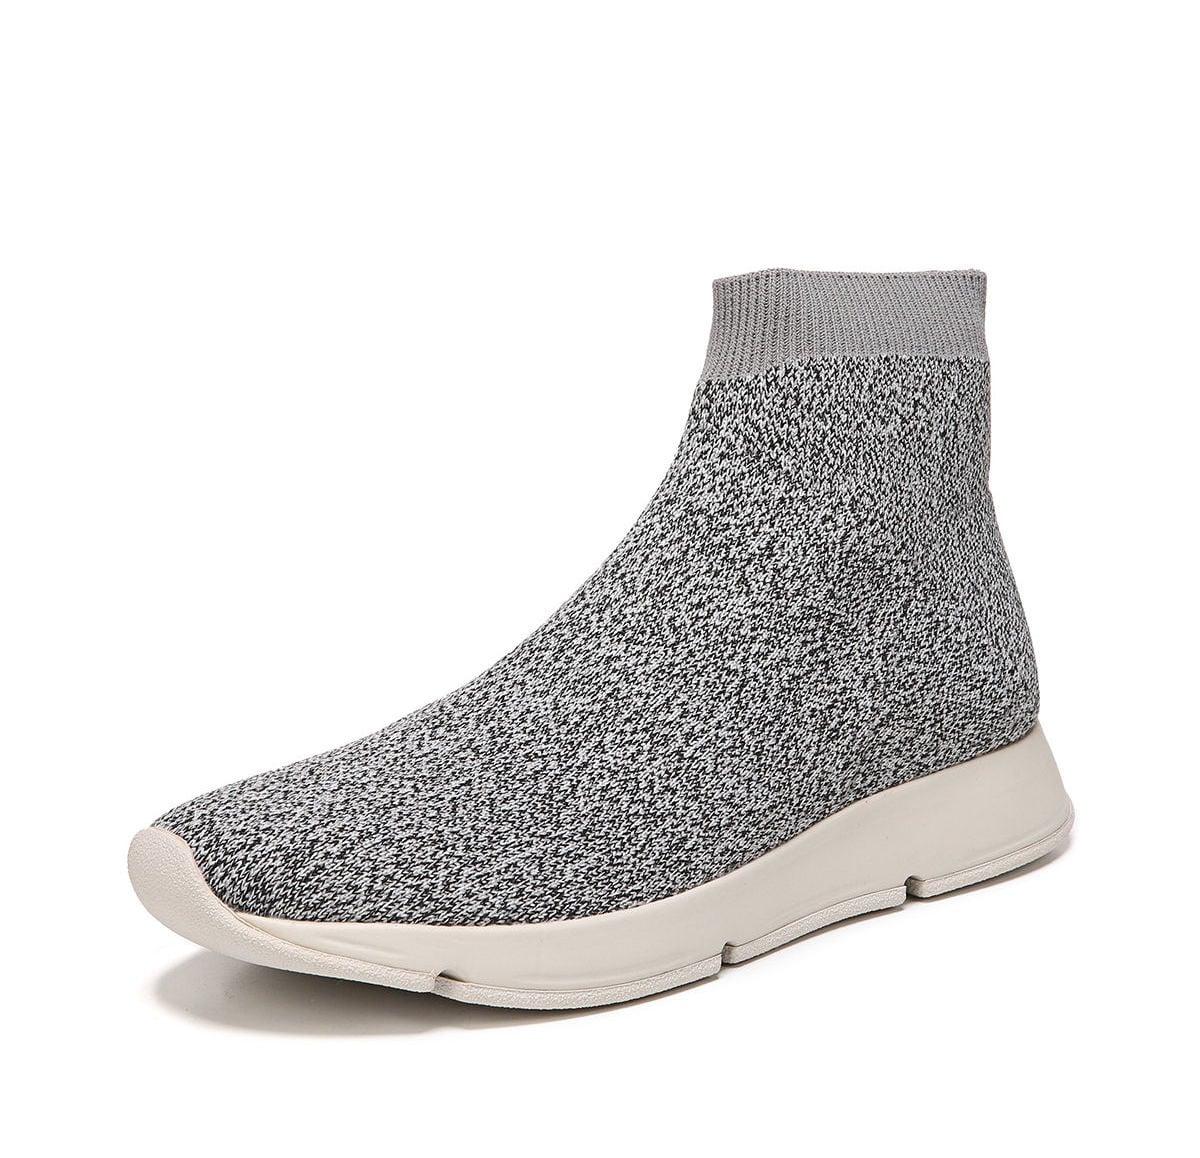 Vince Tyra Knit Sock Sneaker | We Saw